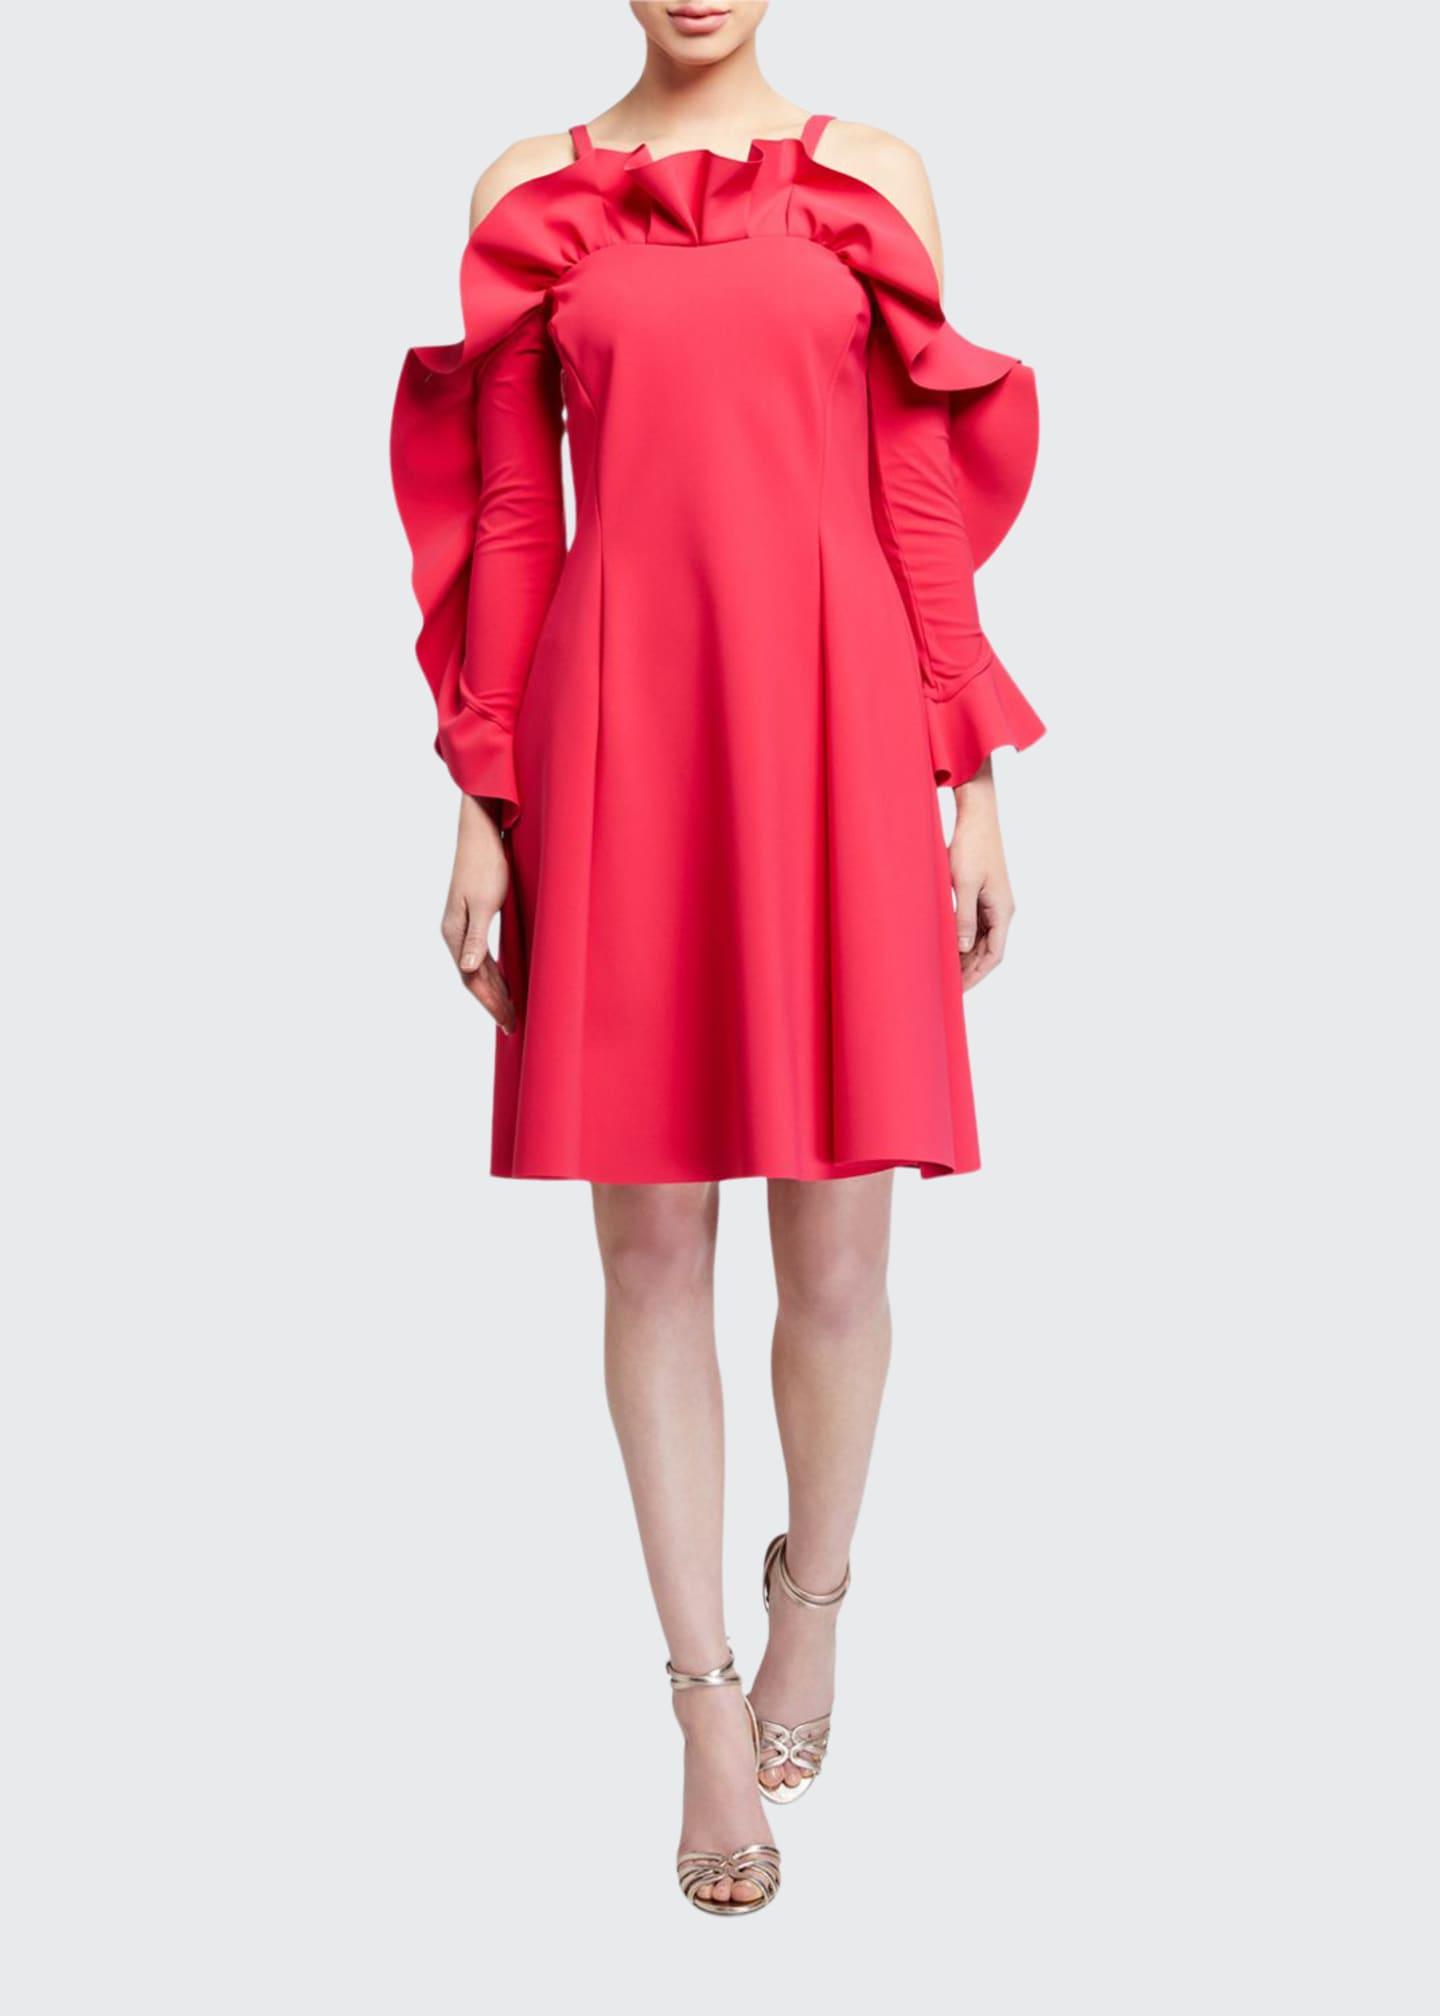 Chiara Boni La Petite Robe Ruffle-Neck Cold-Shoulder A-Line